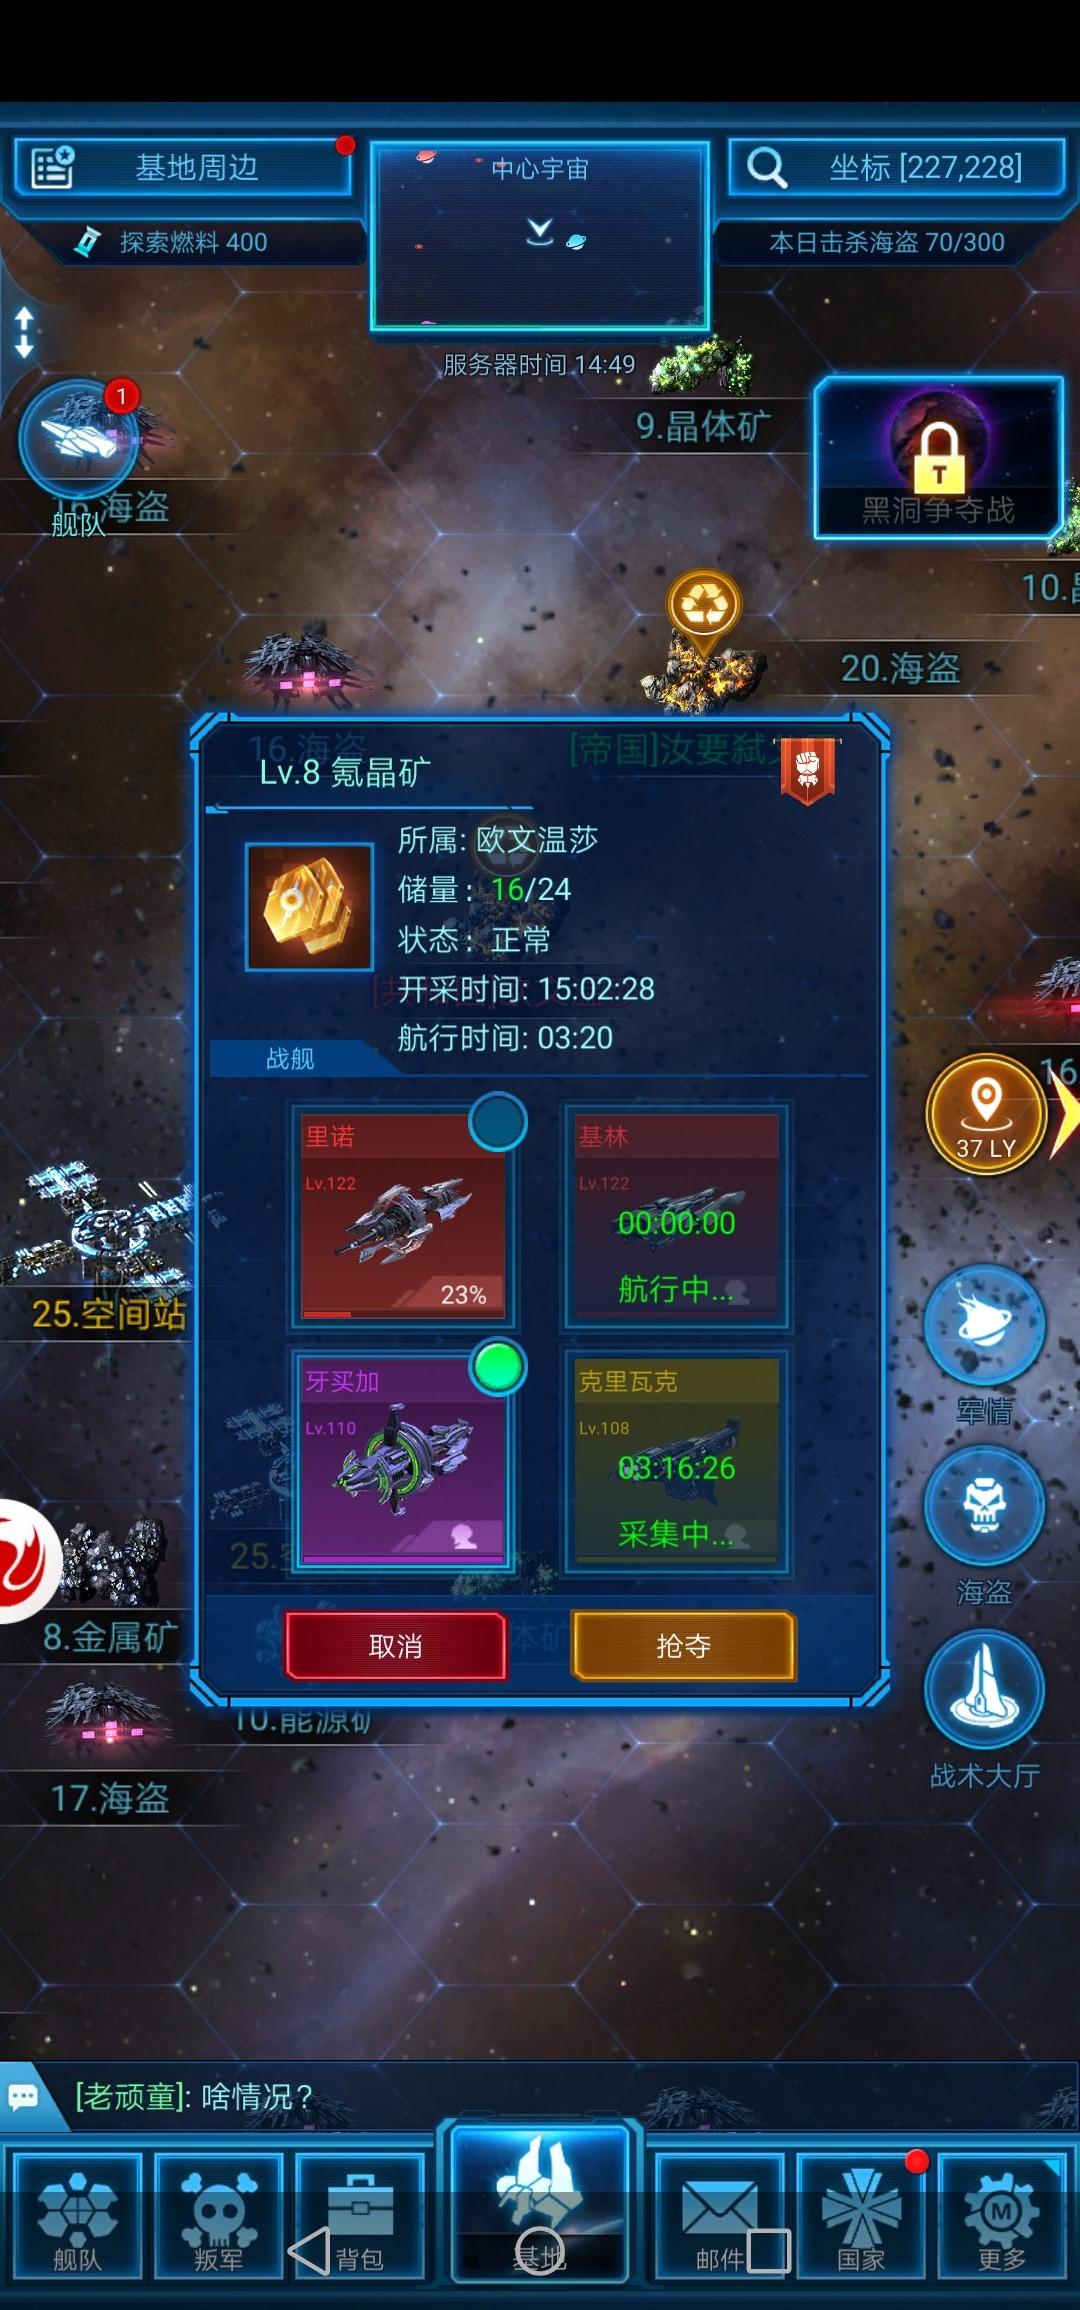 Screenshot_20190802_144945_com.jedigames.p16s.luobo.jpg